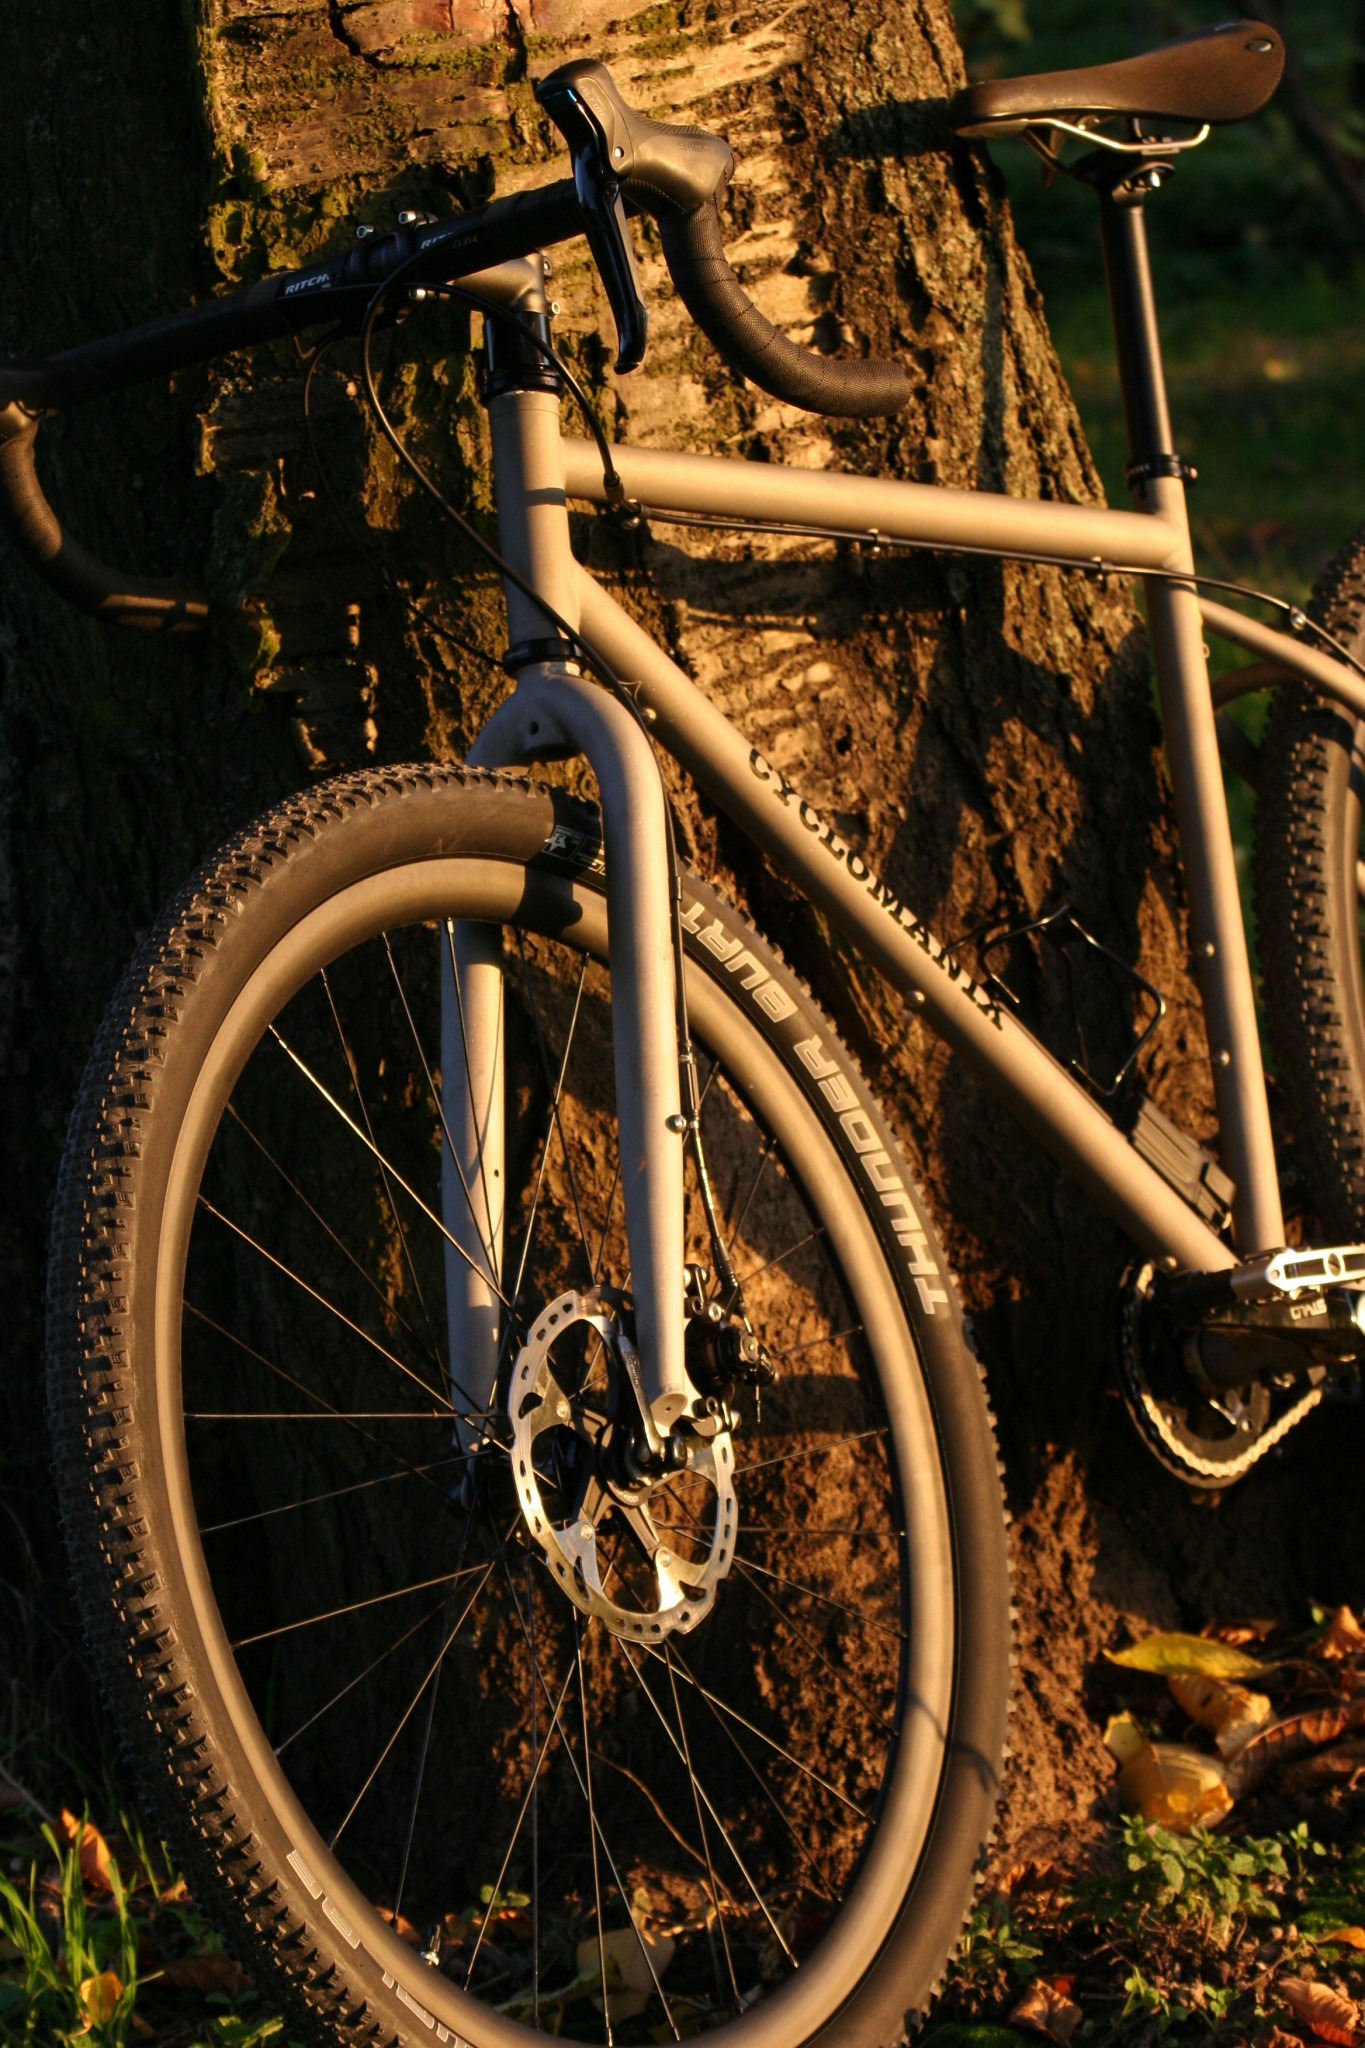 stahl-crossrad-angelehnt-an-baum